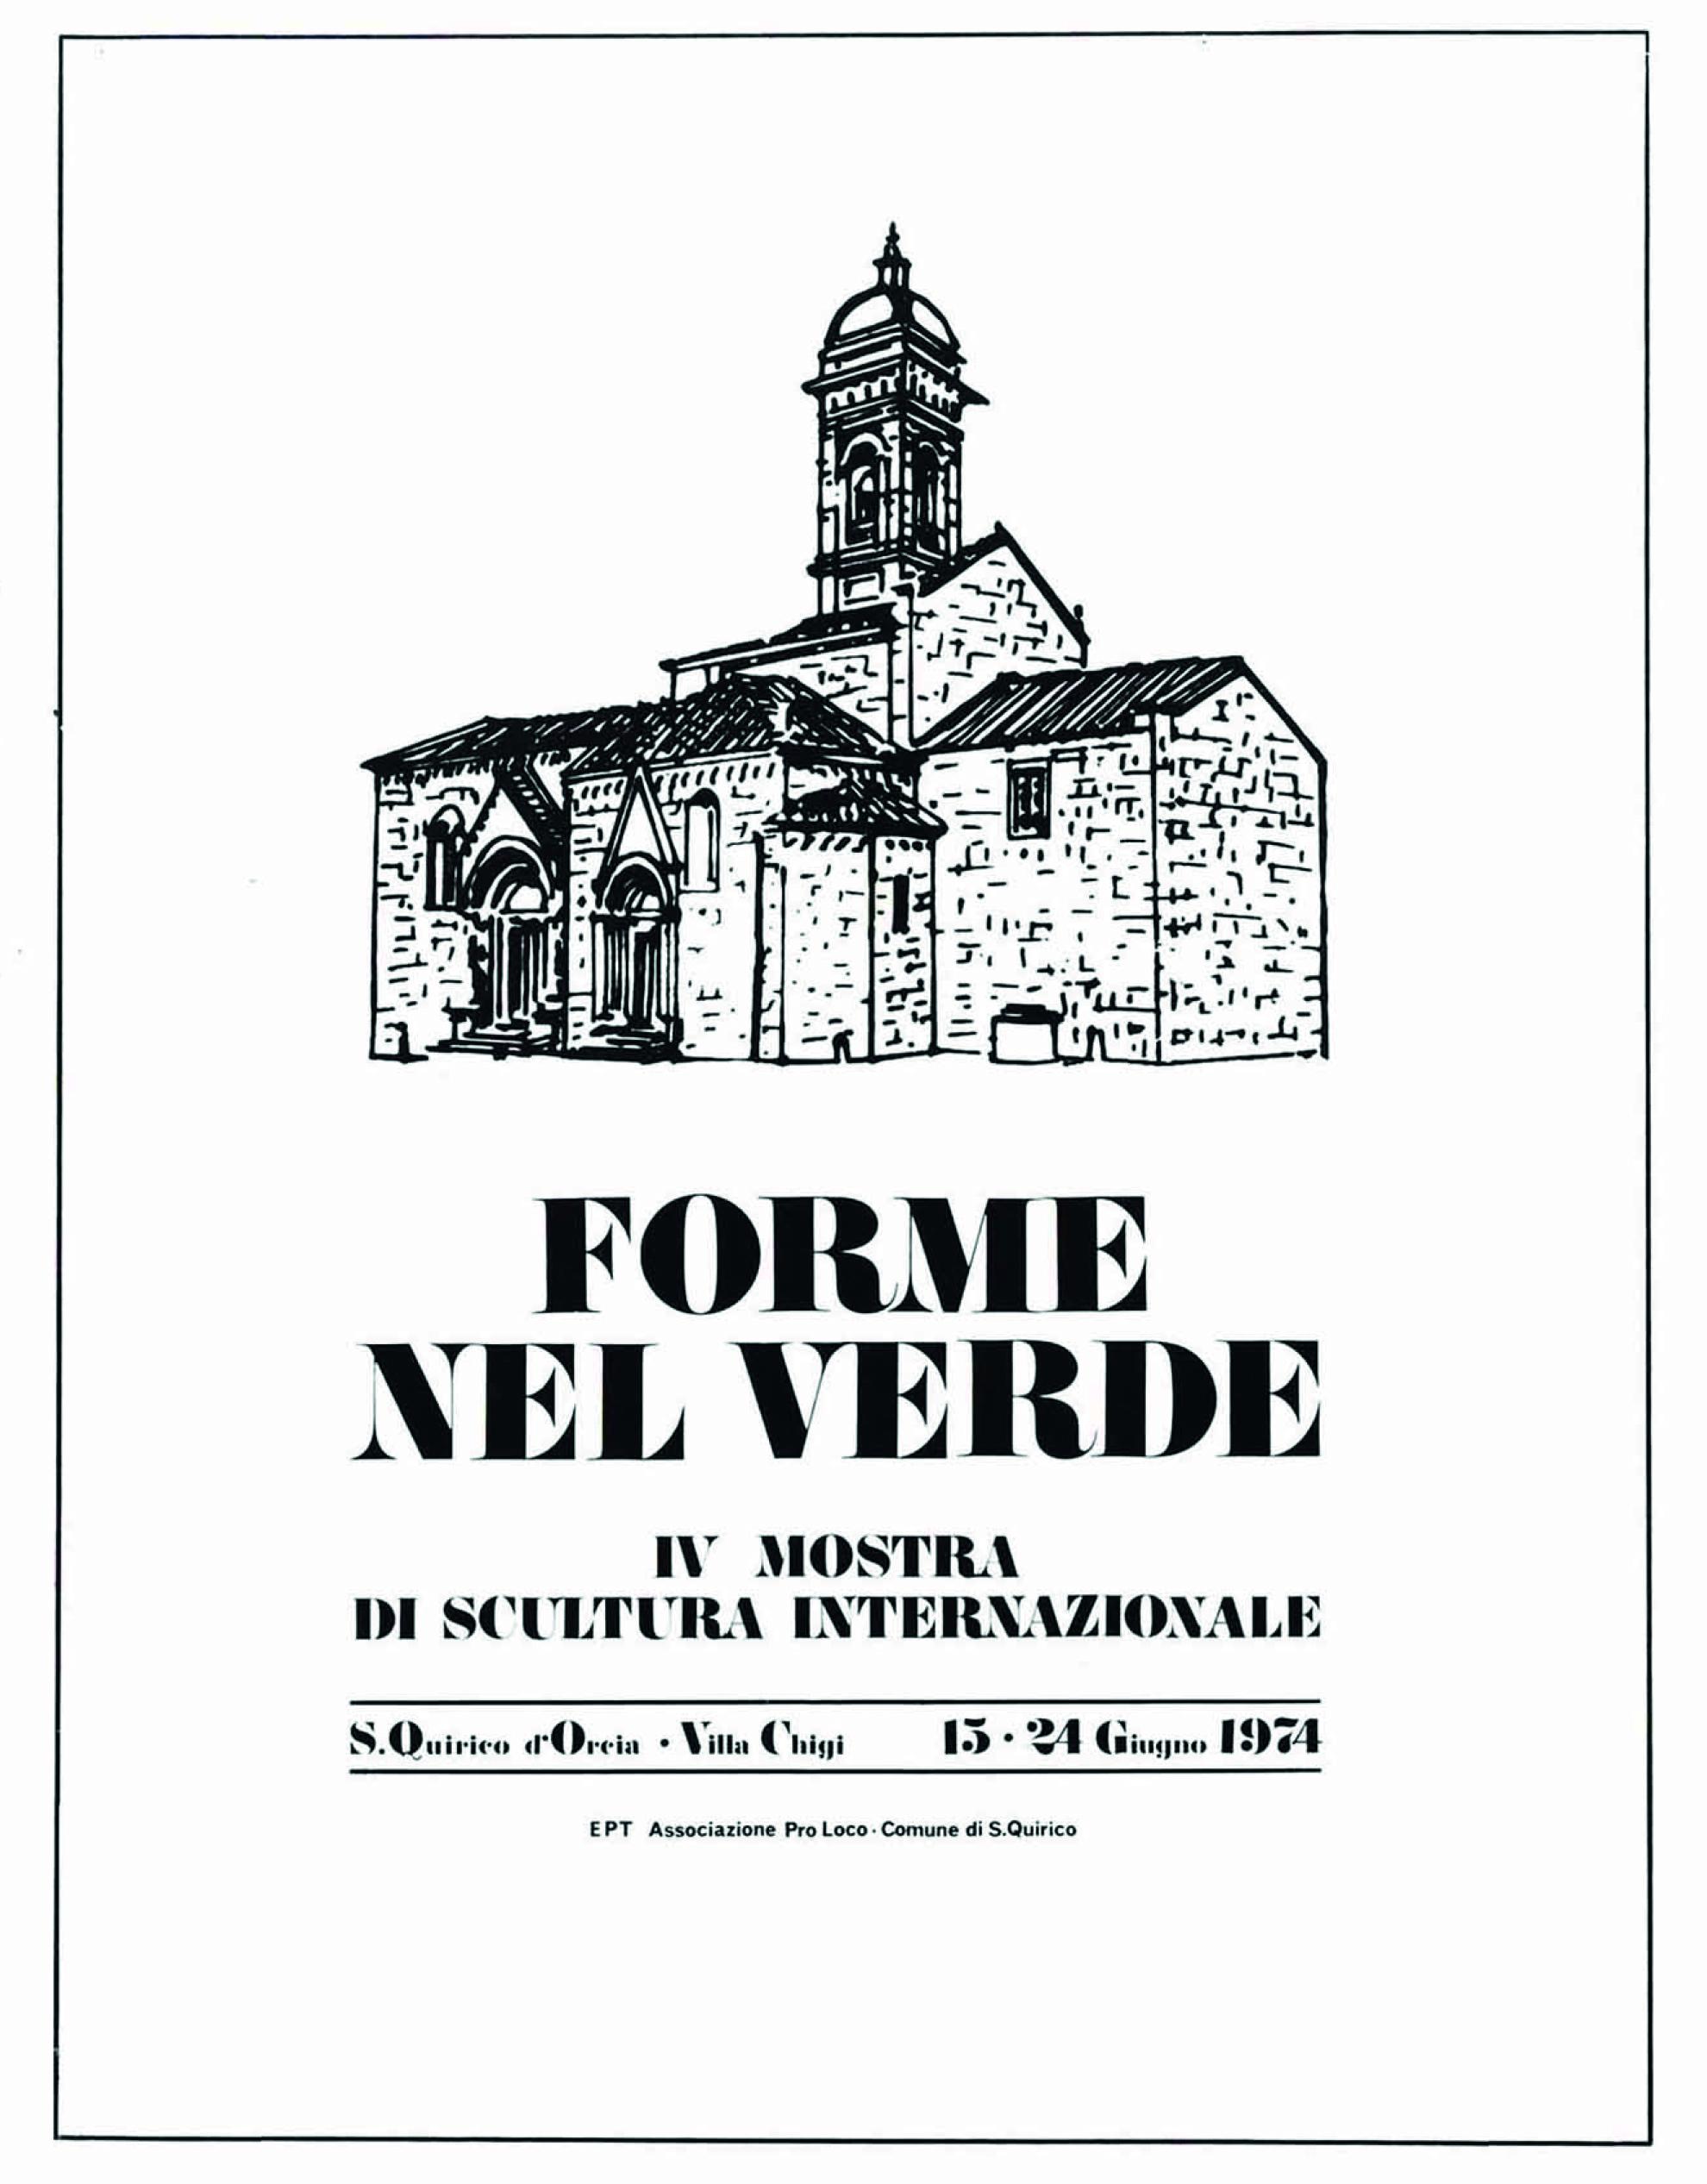 Catalogo Forme nel Verde 1974